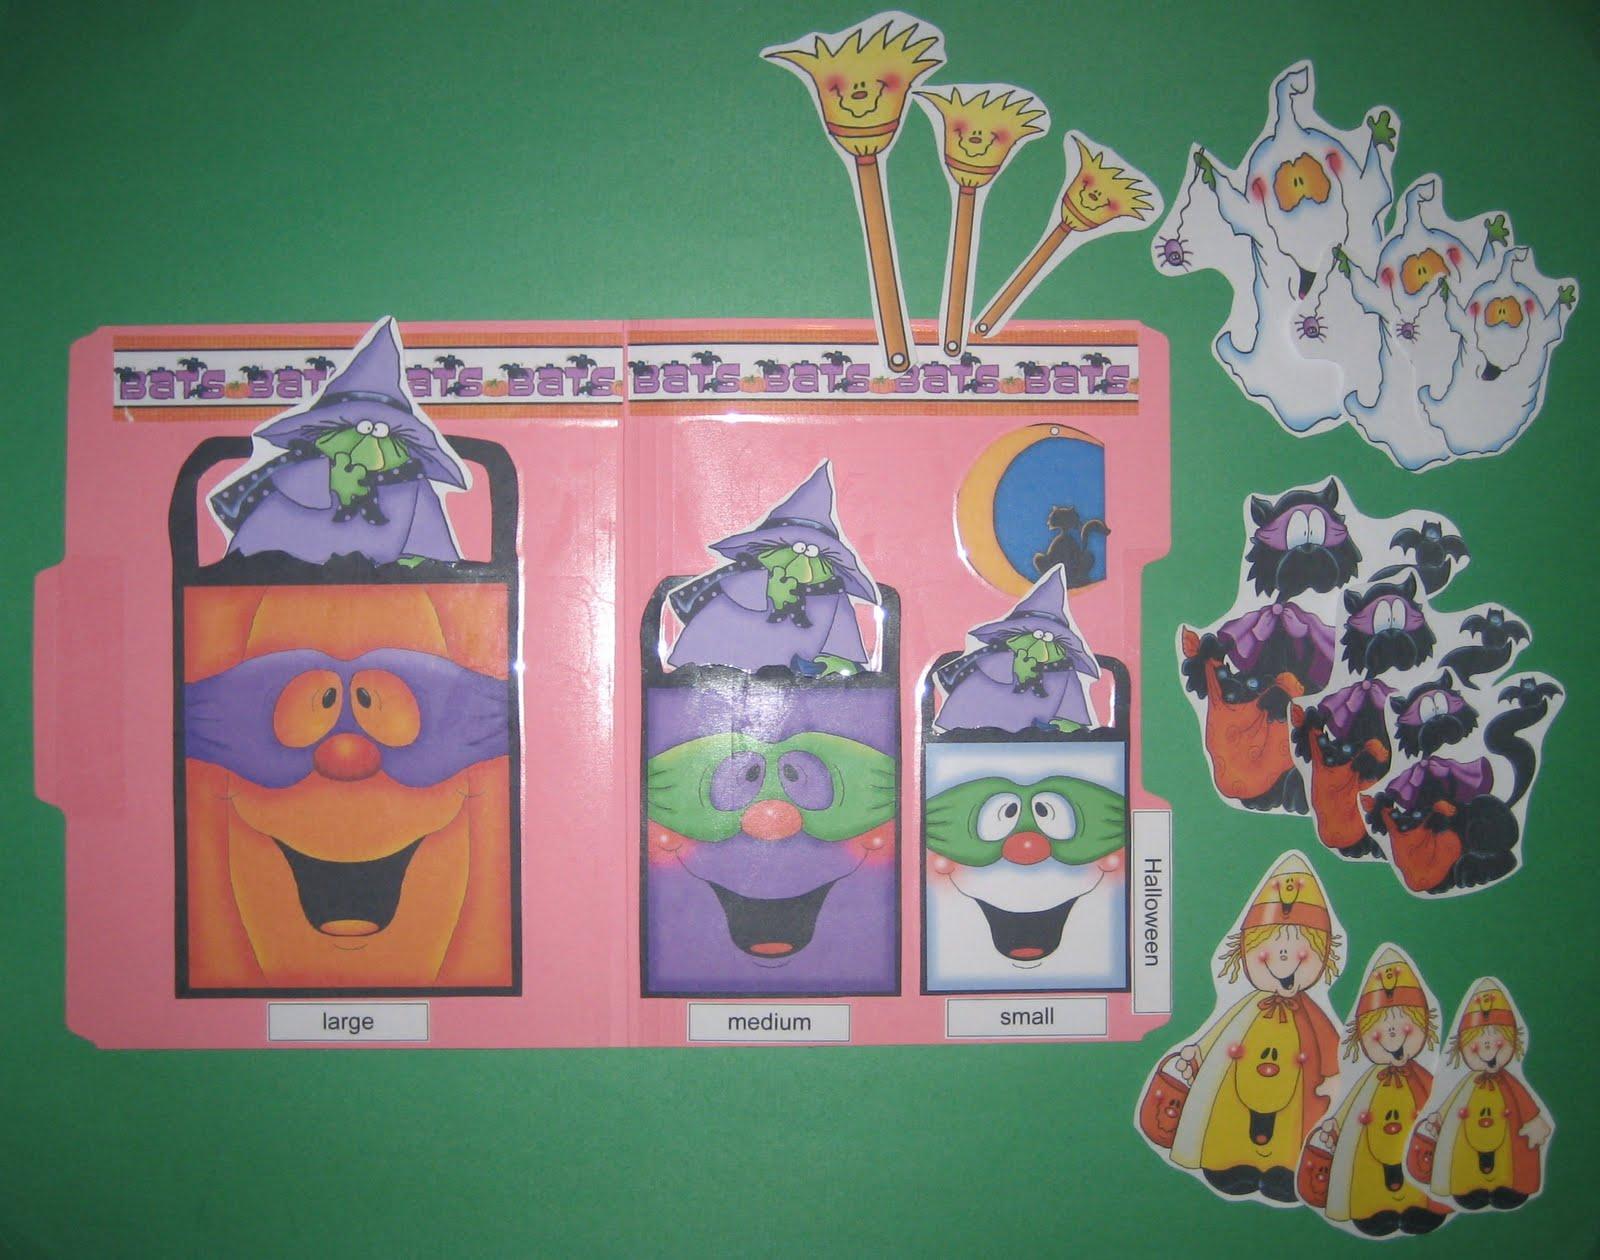 halloween sequencing file folder game - Halloween File Folder Games